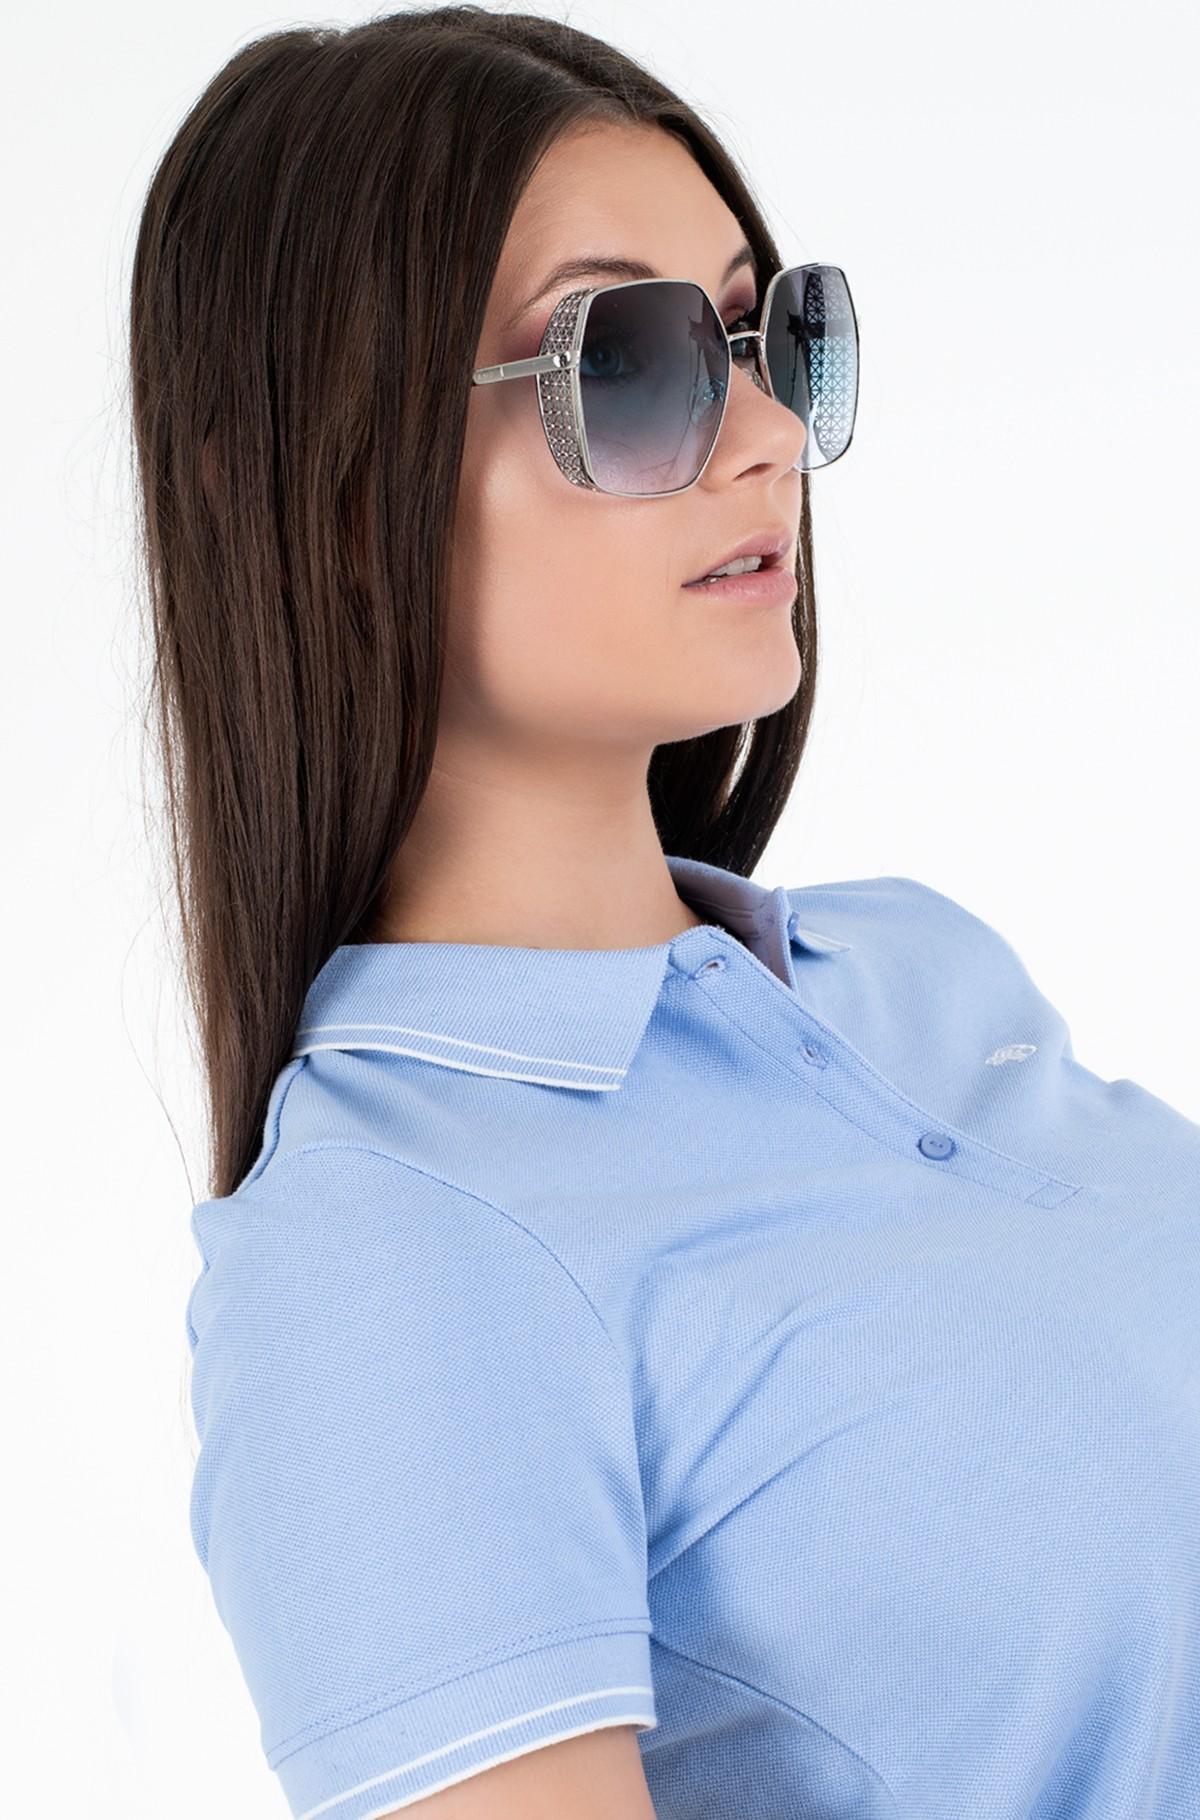 Sunglasses 0808-full-1